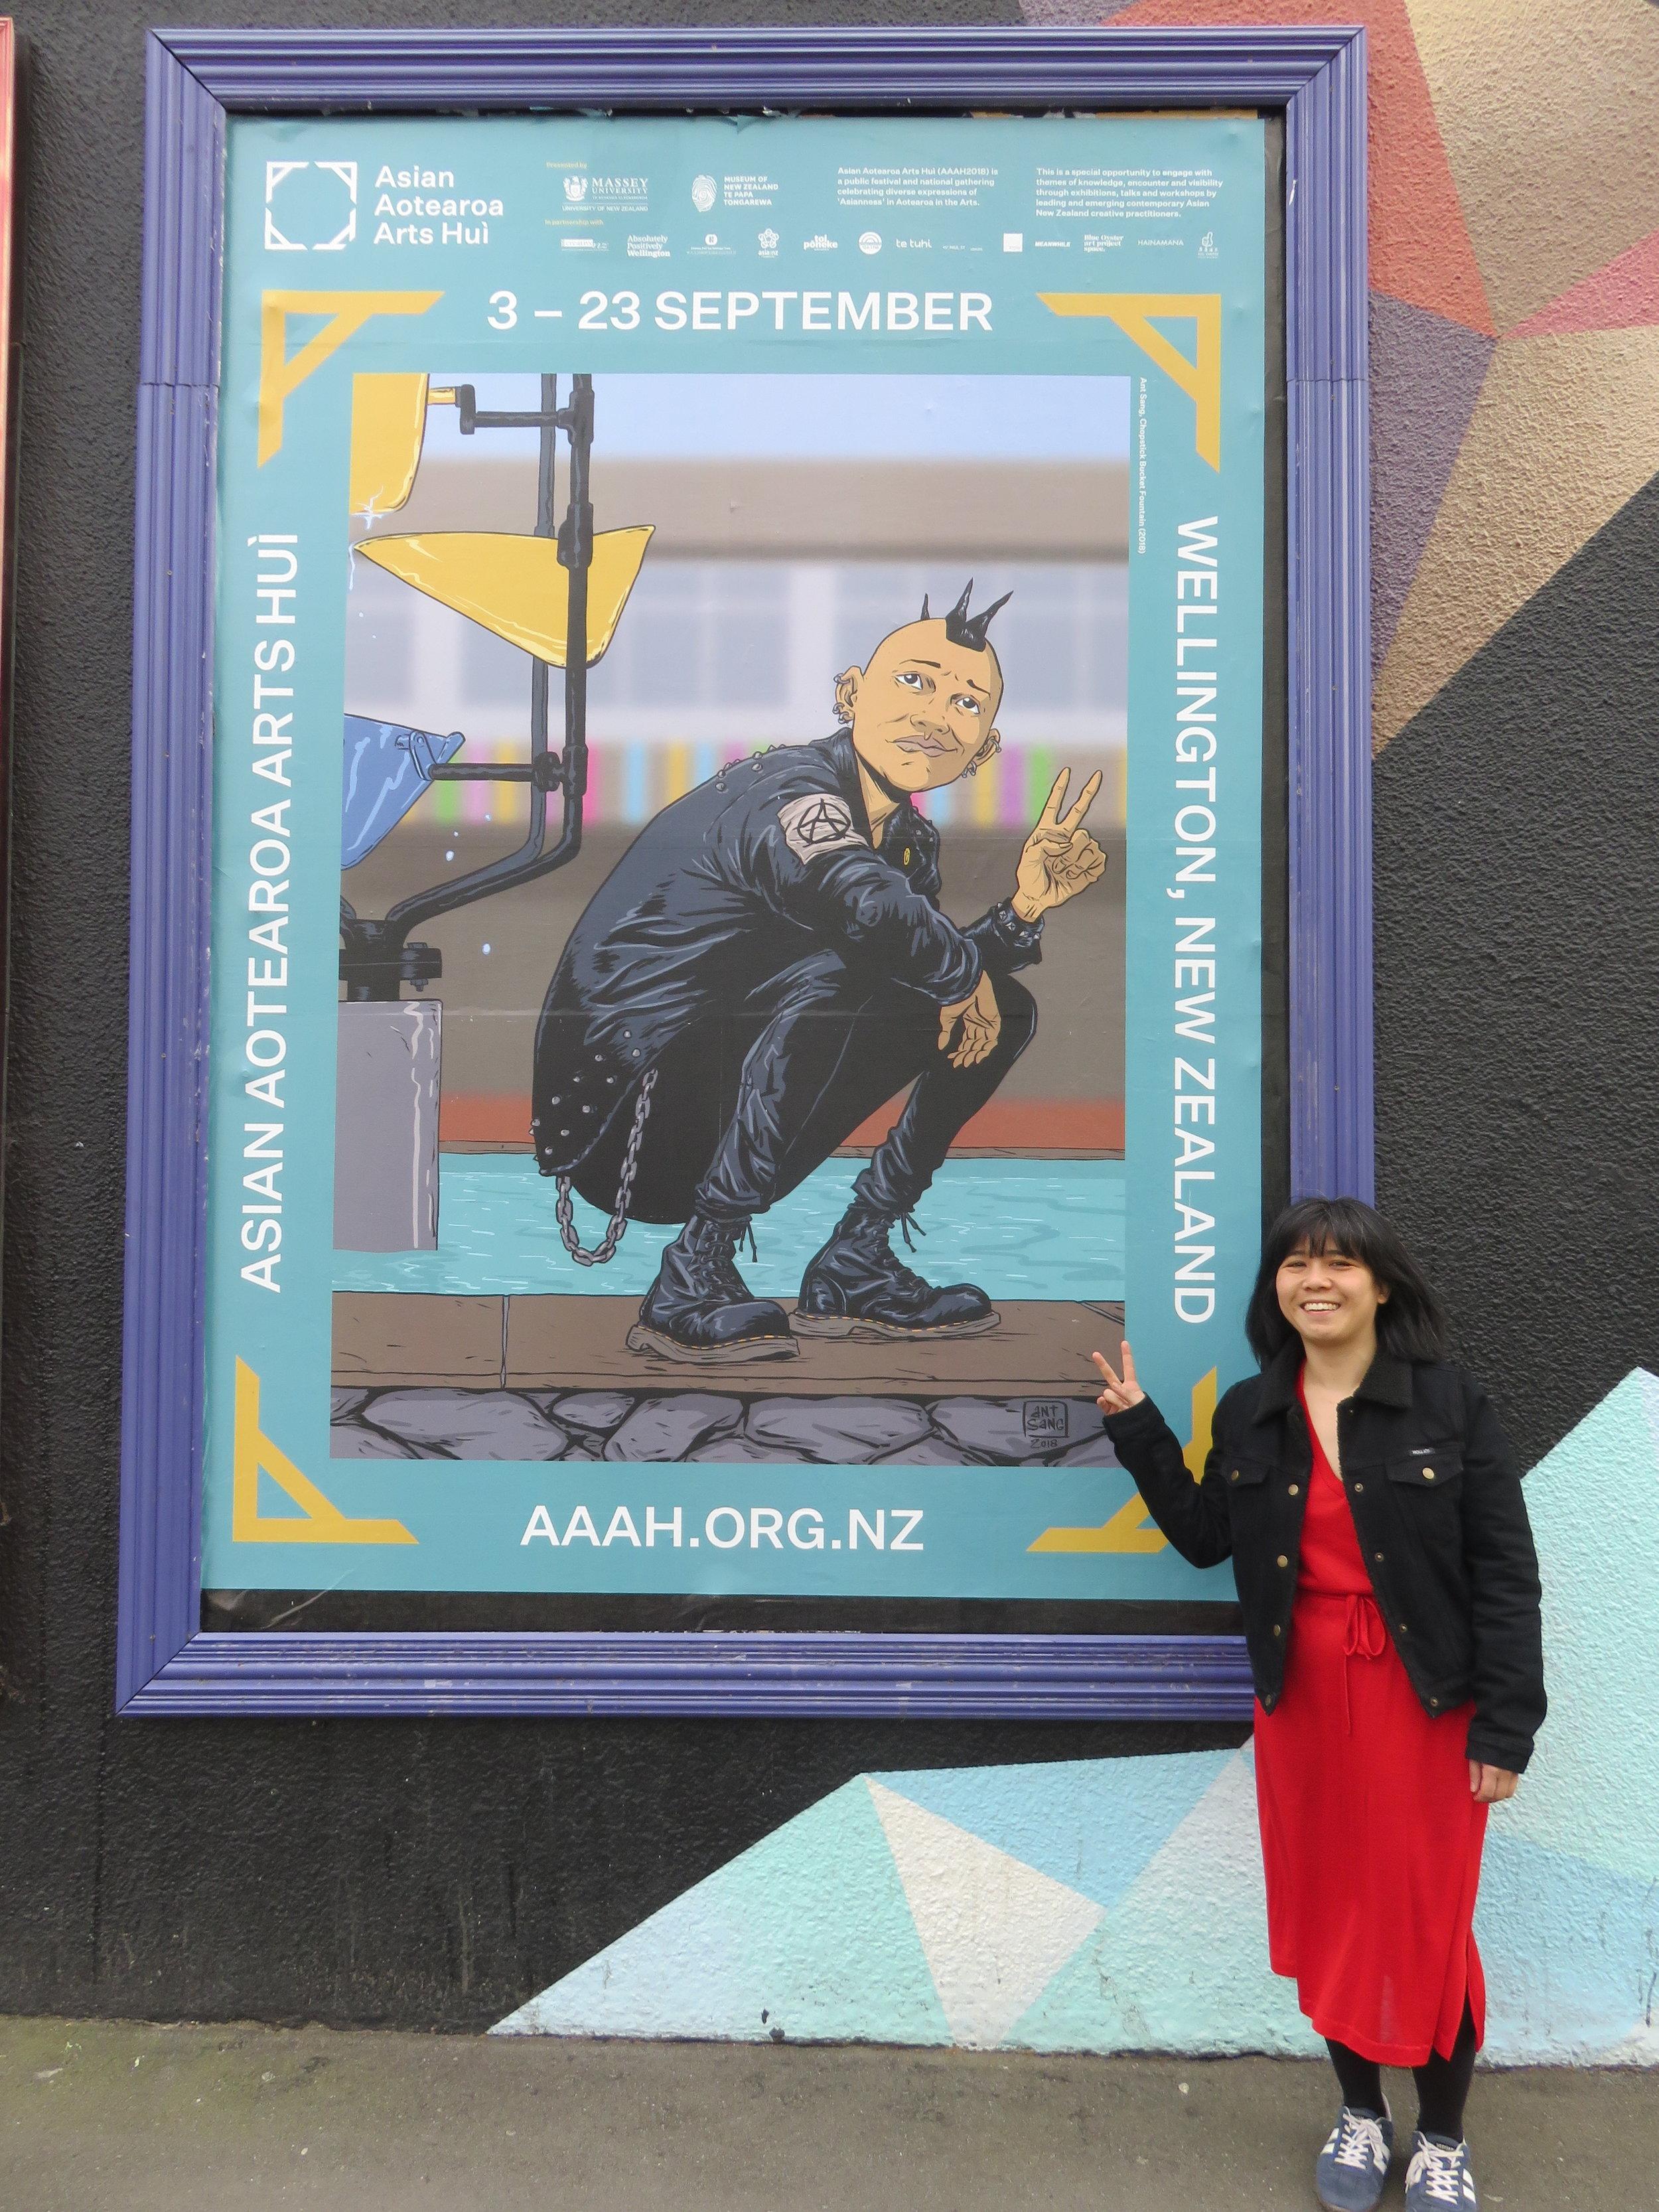 Kerry Ann Lee with the AAAH2018 Artist Billboard Campaign, 1 - 23 September, Wellington CBD. Photo by Sam Buchanan